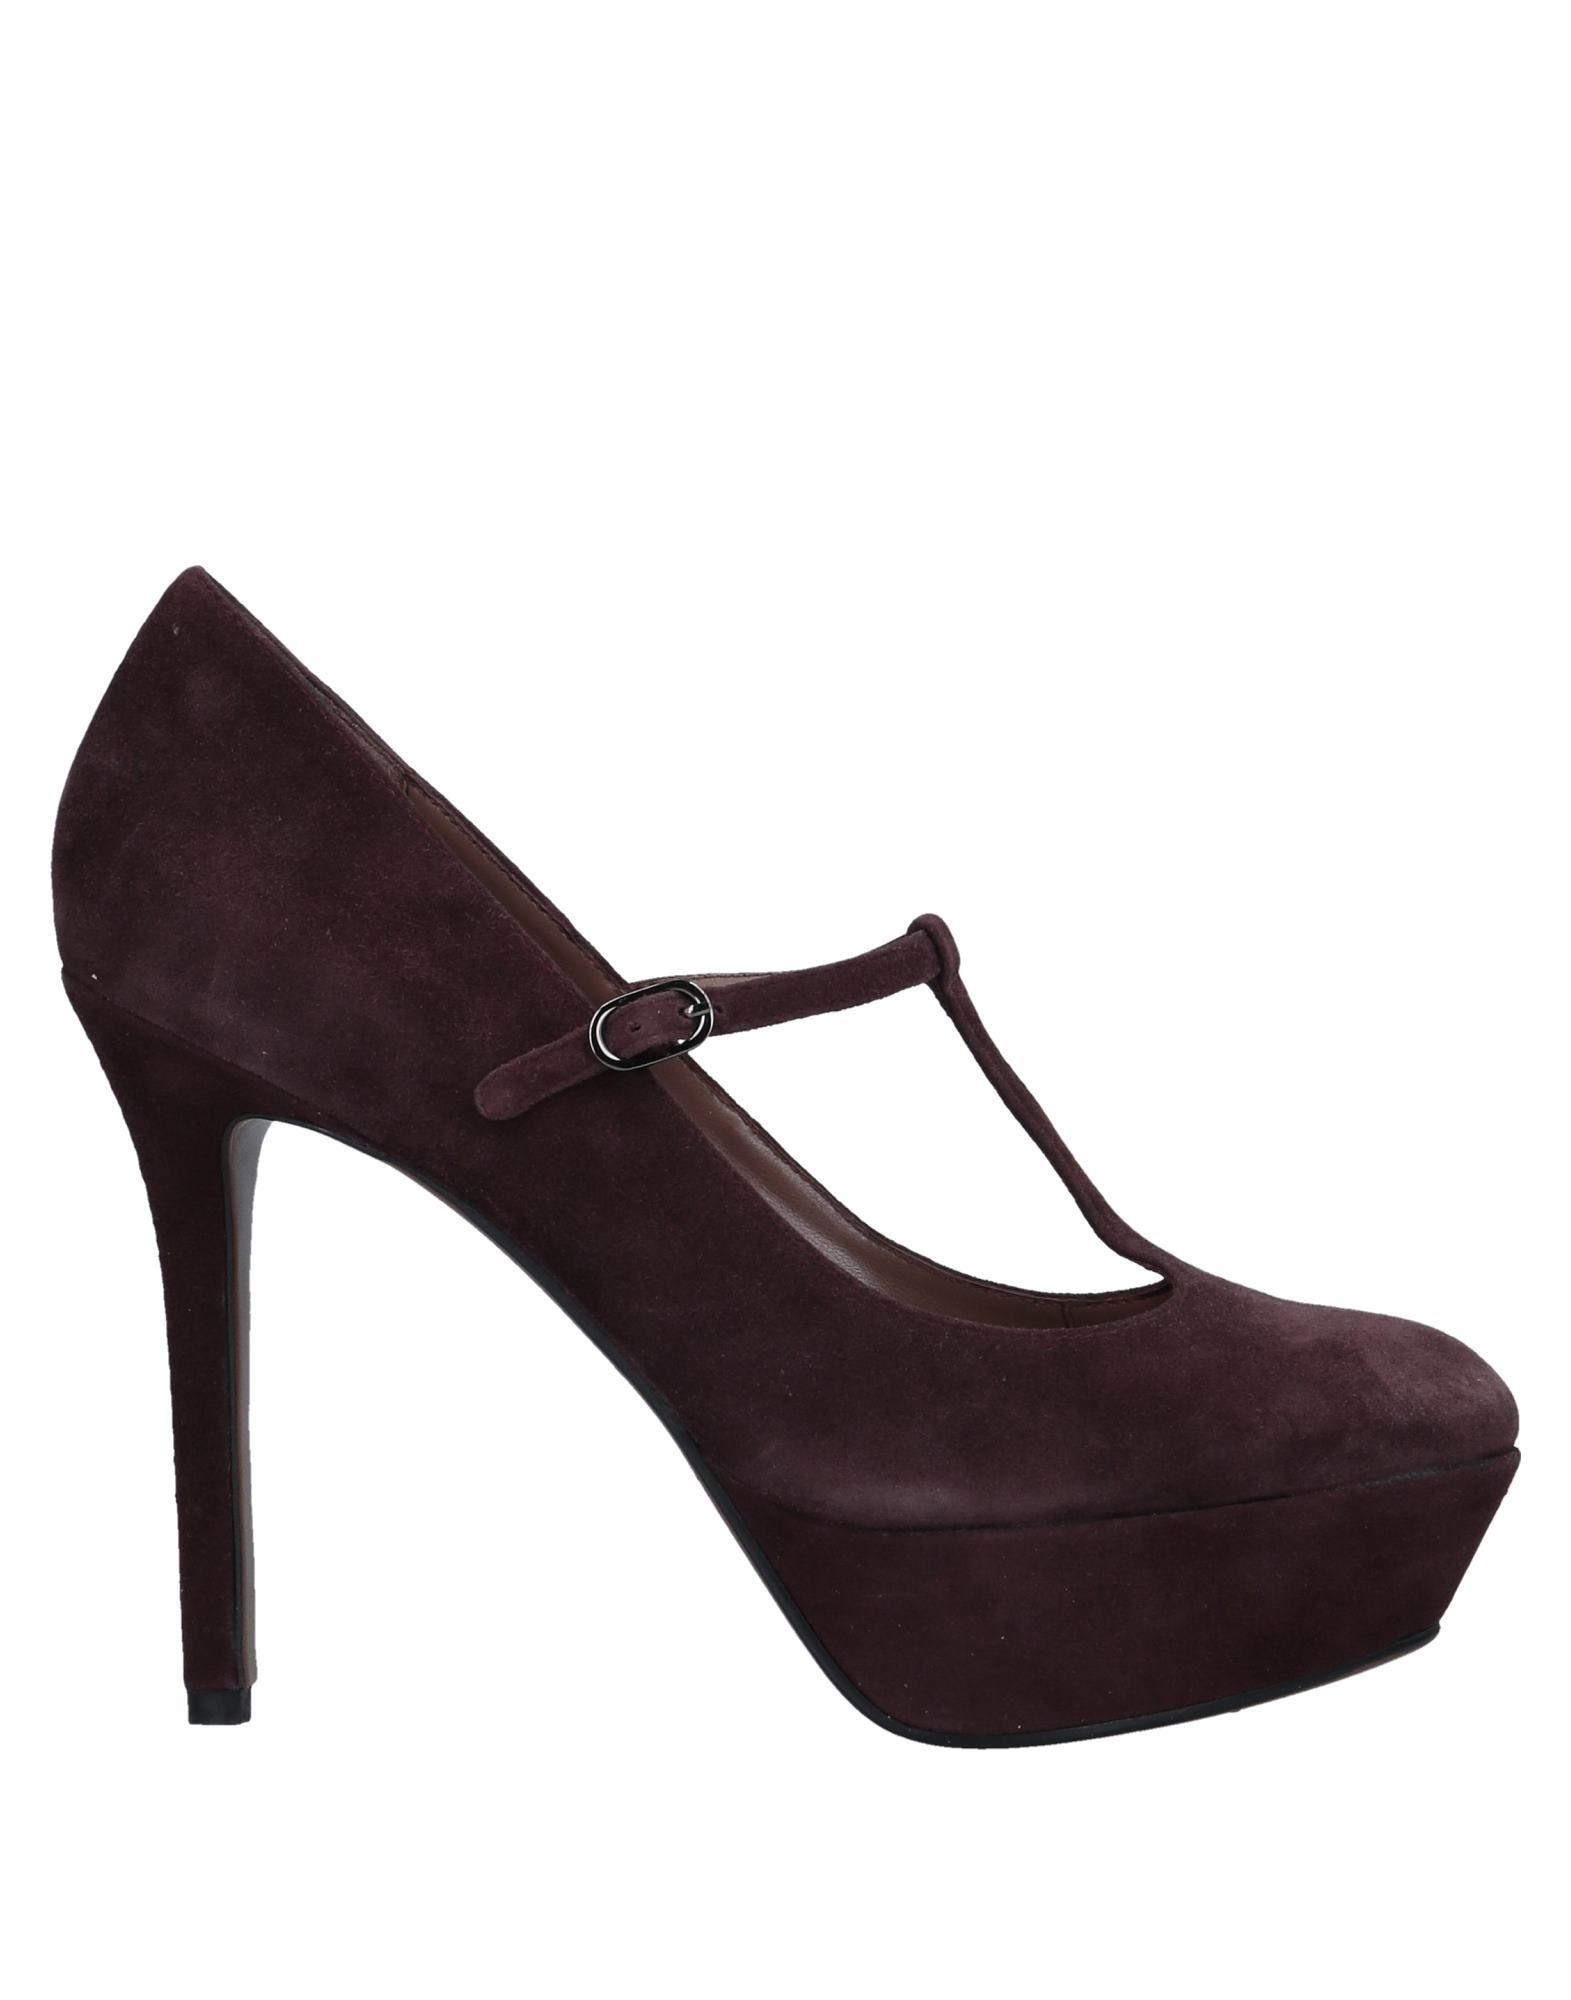 Sandali Camper Donna - scarpe 44640779IM Nuove offerte e scarpe - comode 2cf844